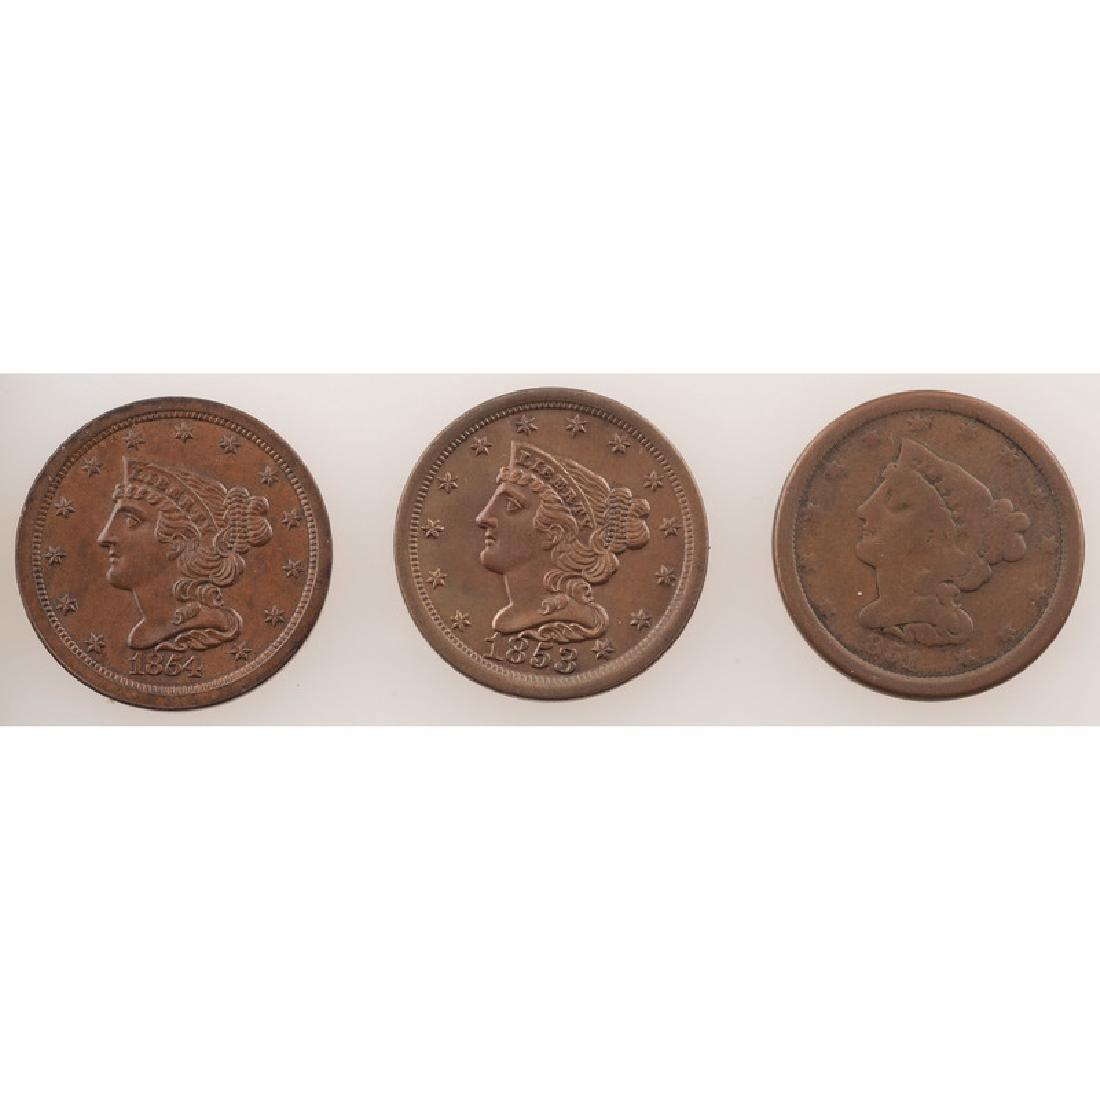 United States Braided Hair Half Cents 1851-1854